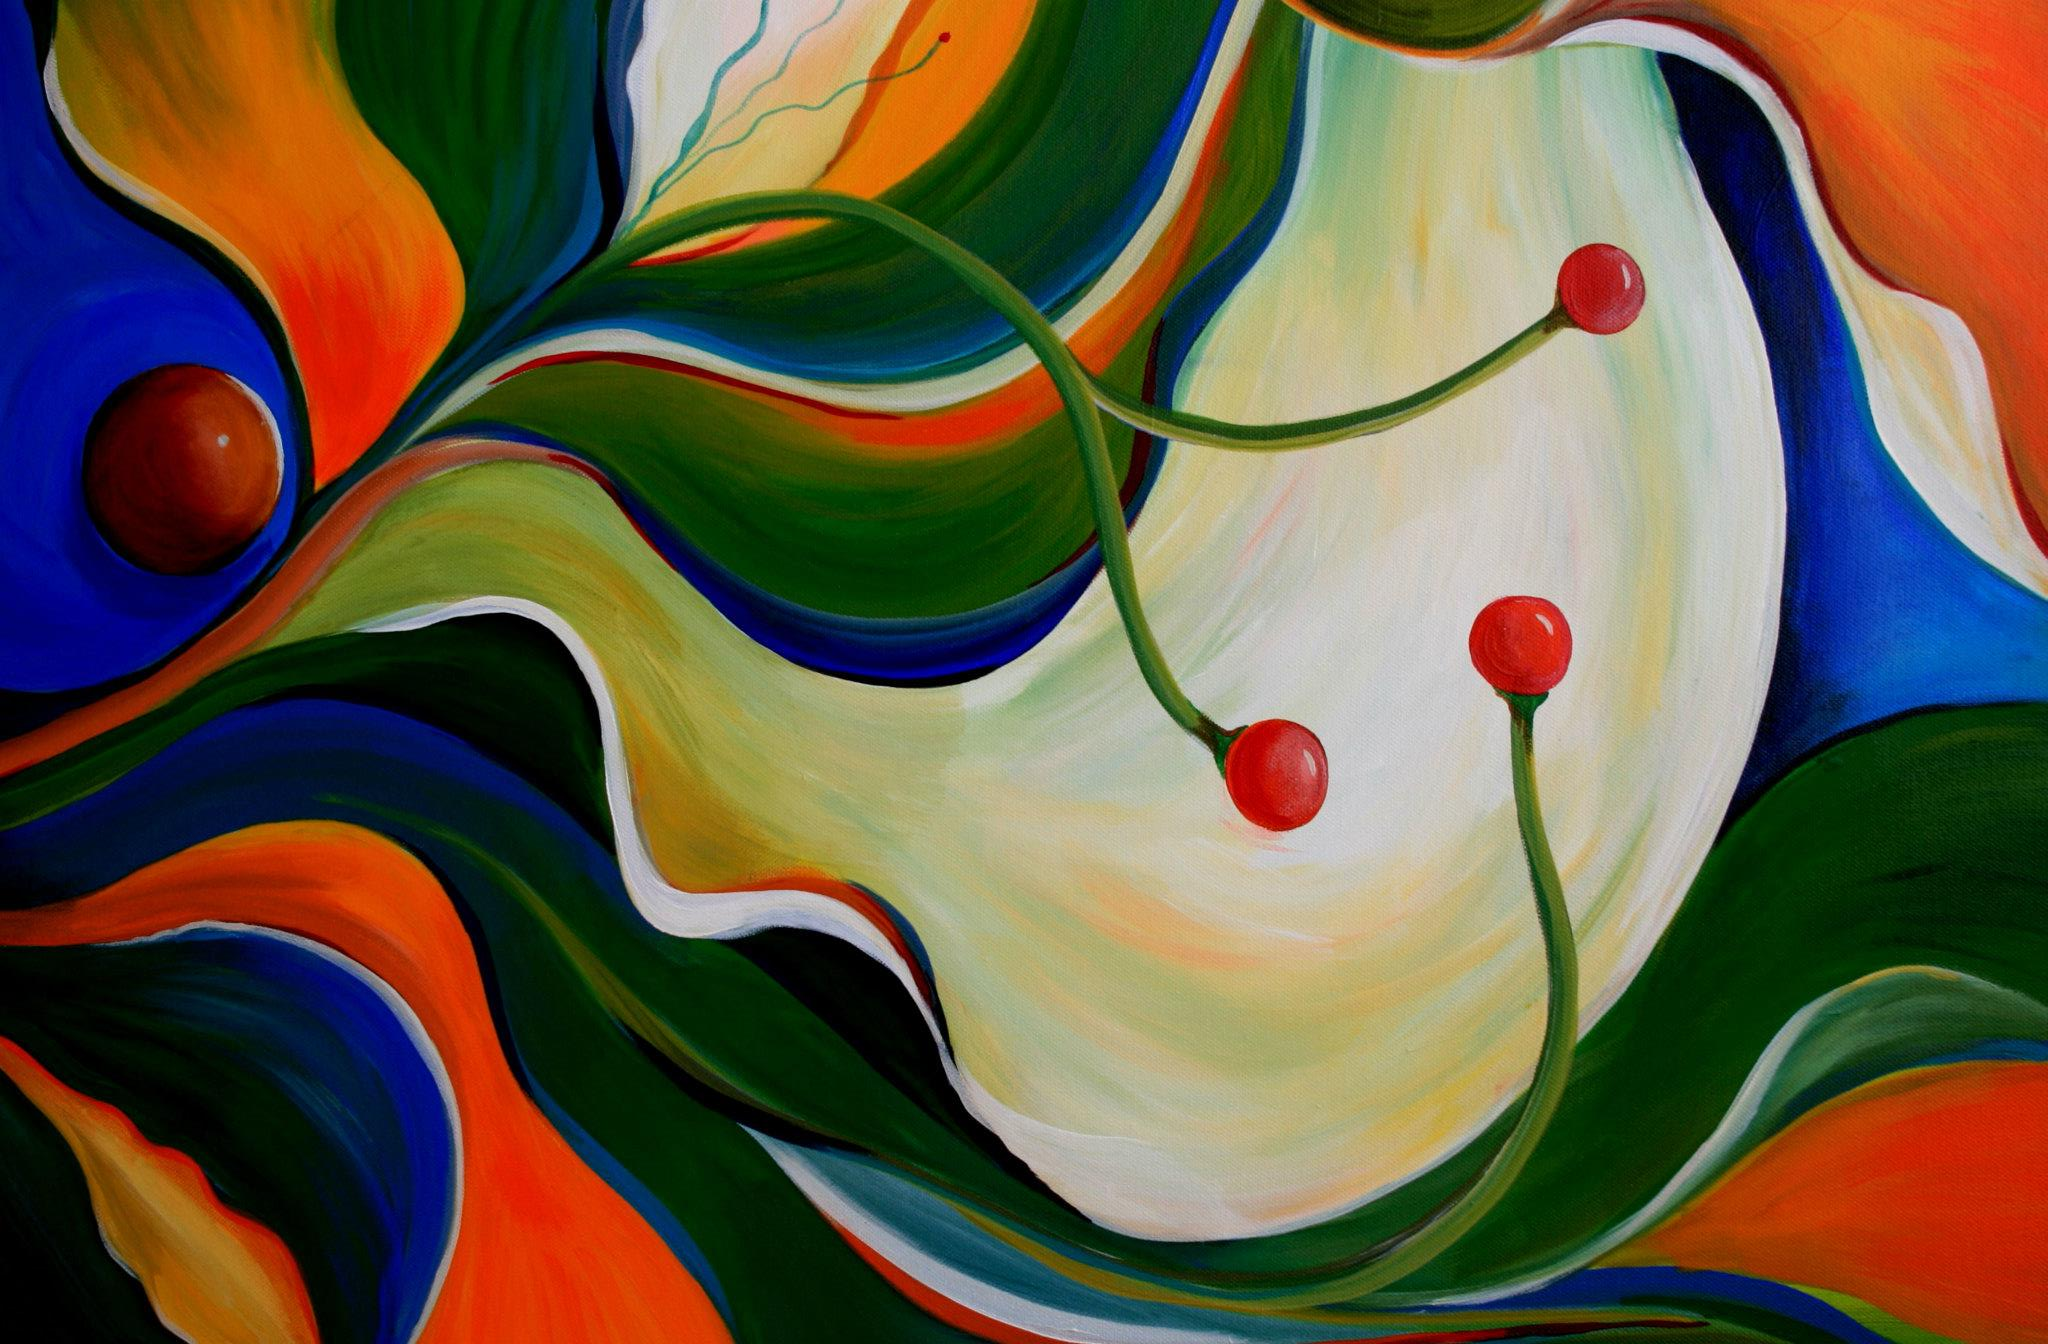 http://www.pt-arts.de/malerei/